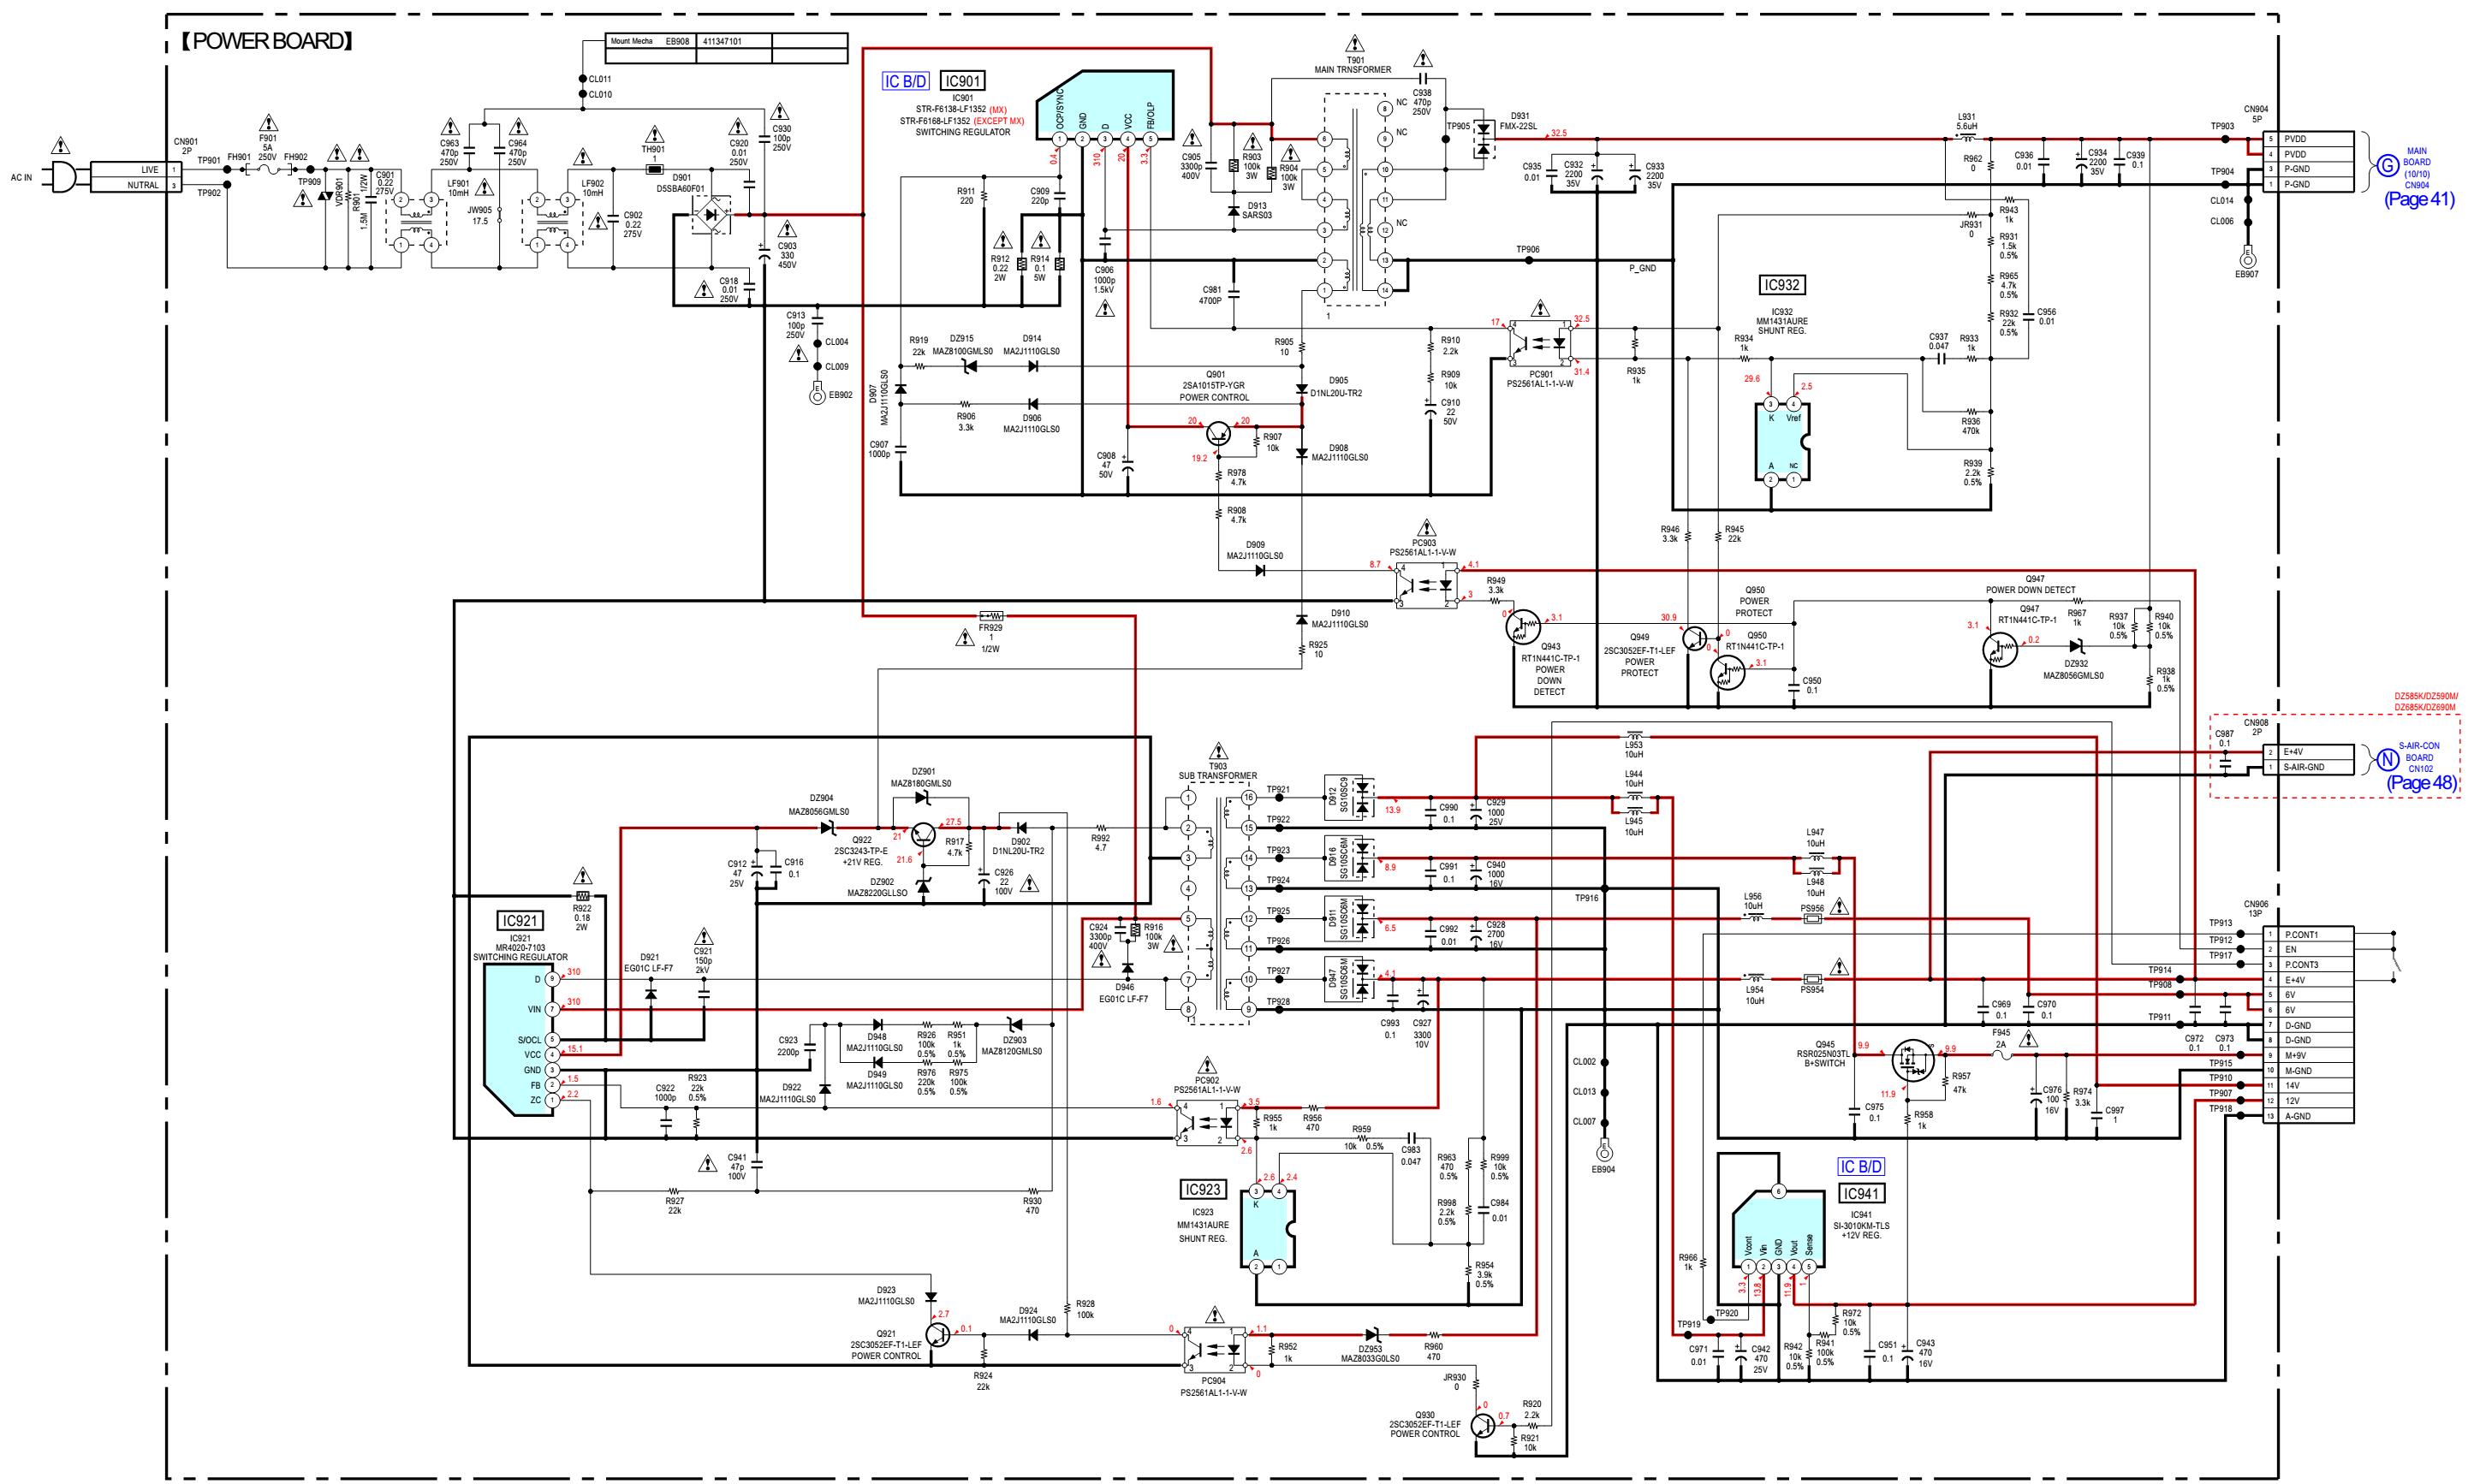 power supply01